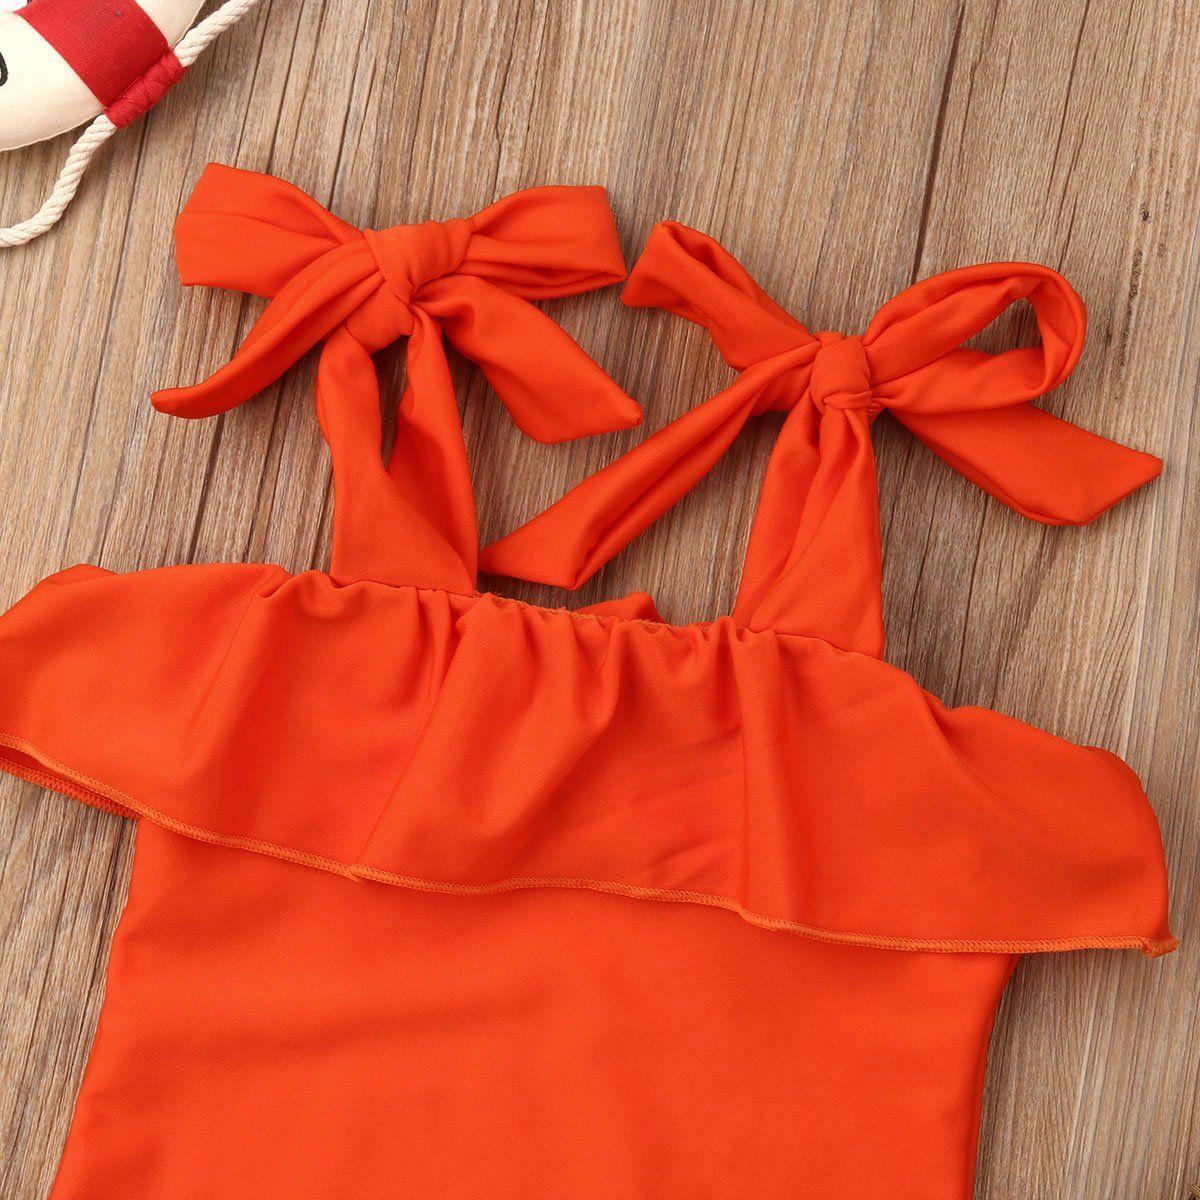 6e7efcf4520 2019 New Baby Kid Girls Swimwear Summer Ruffles One Piece Bikini Swimsuit  Beach Bathing Suit Baby Girl Clothes 0-5T